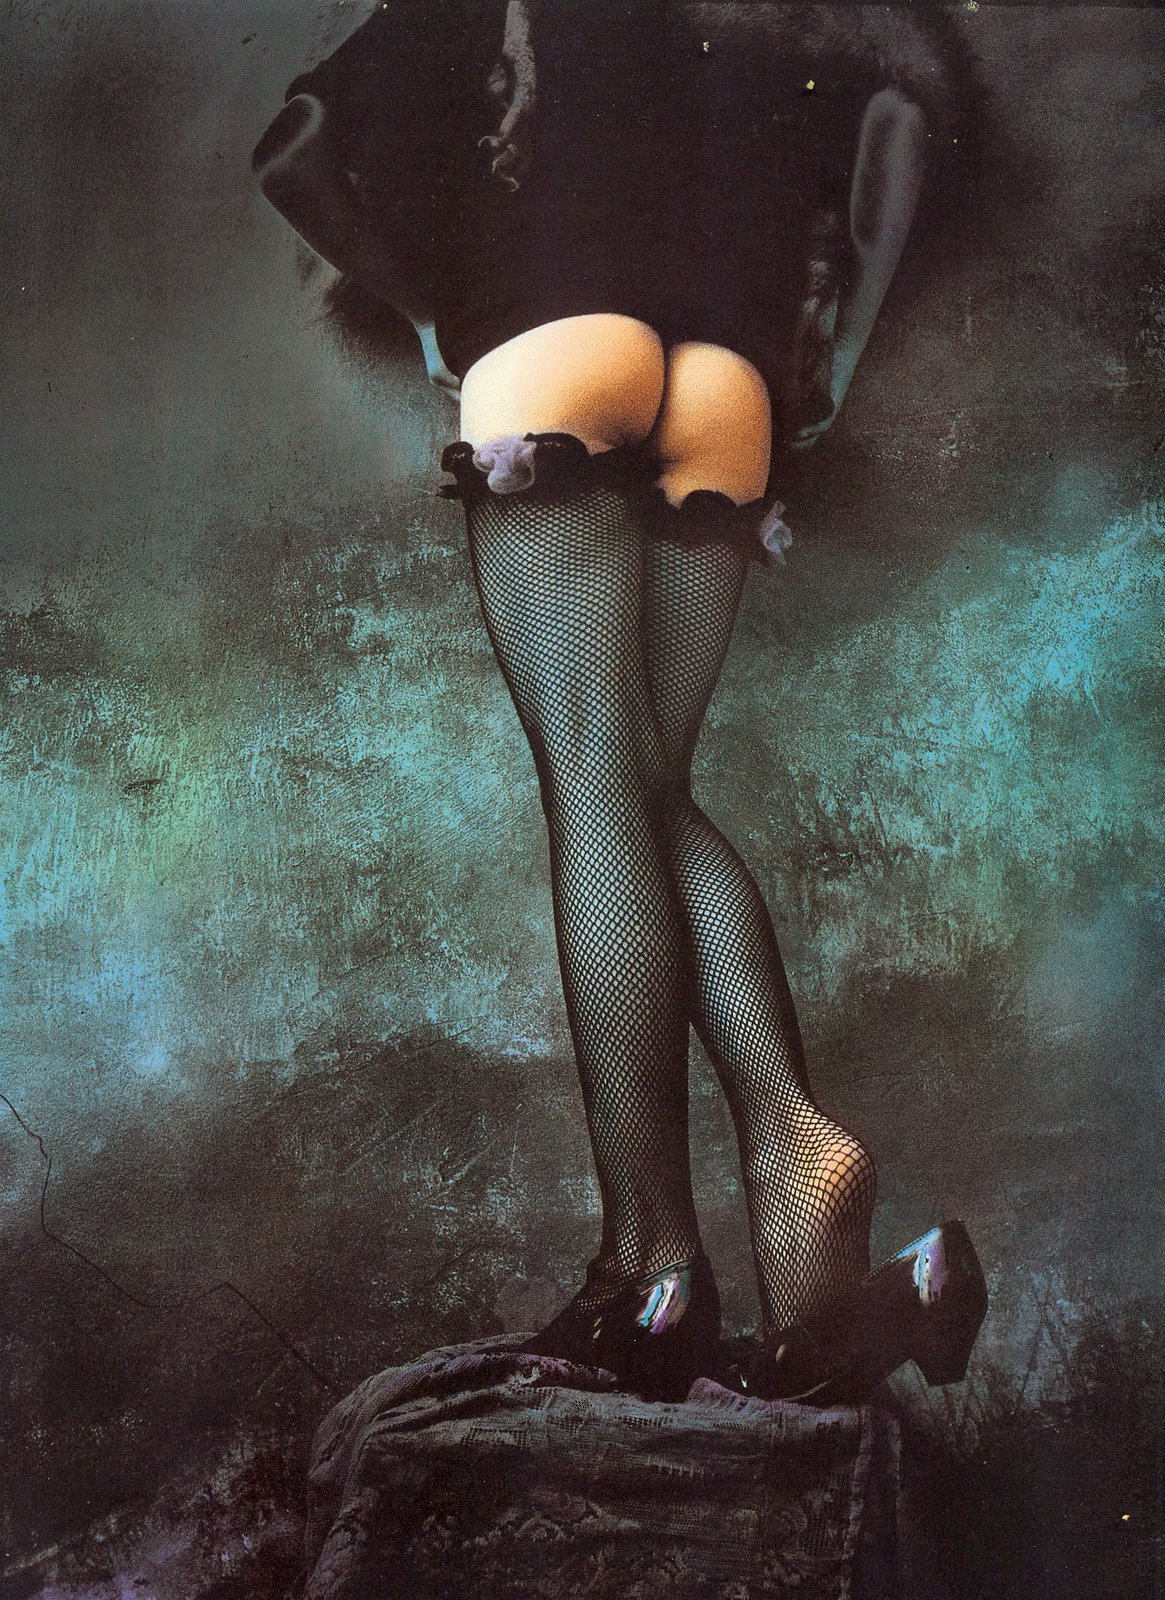 """NEW YORK '85"", ΦΩΤΟΓΡΑΦΟΣ: JAN SAUDEK!!"